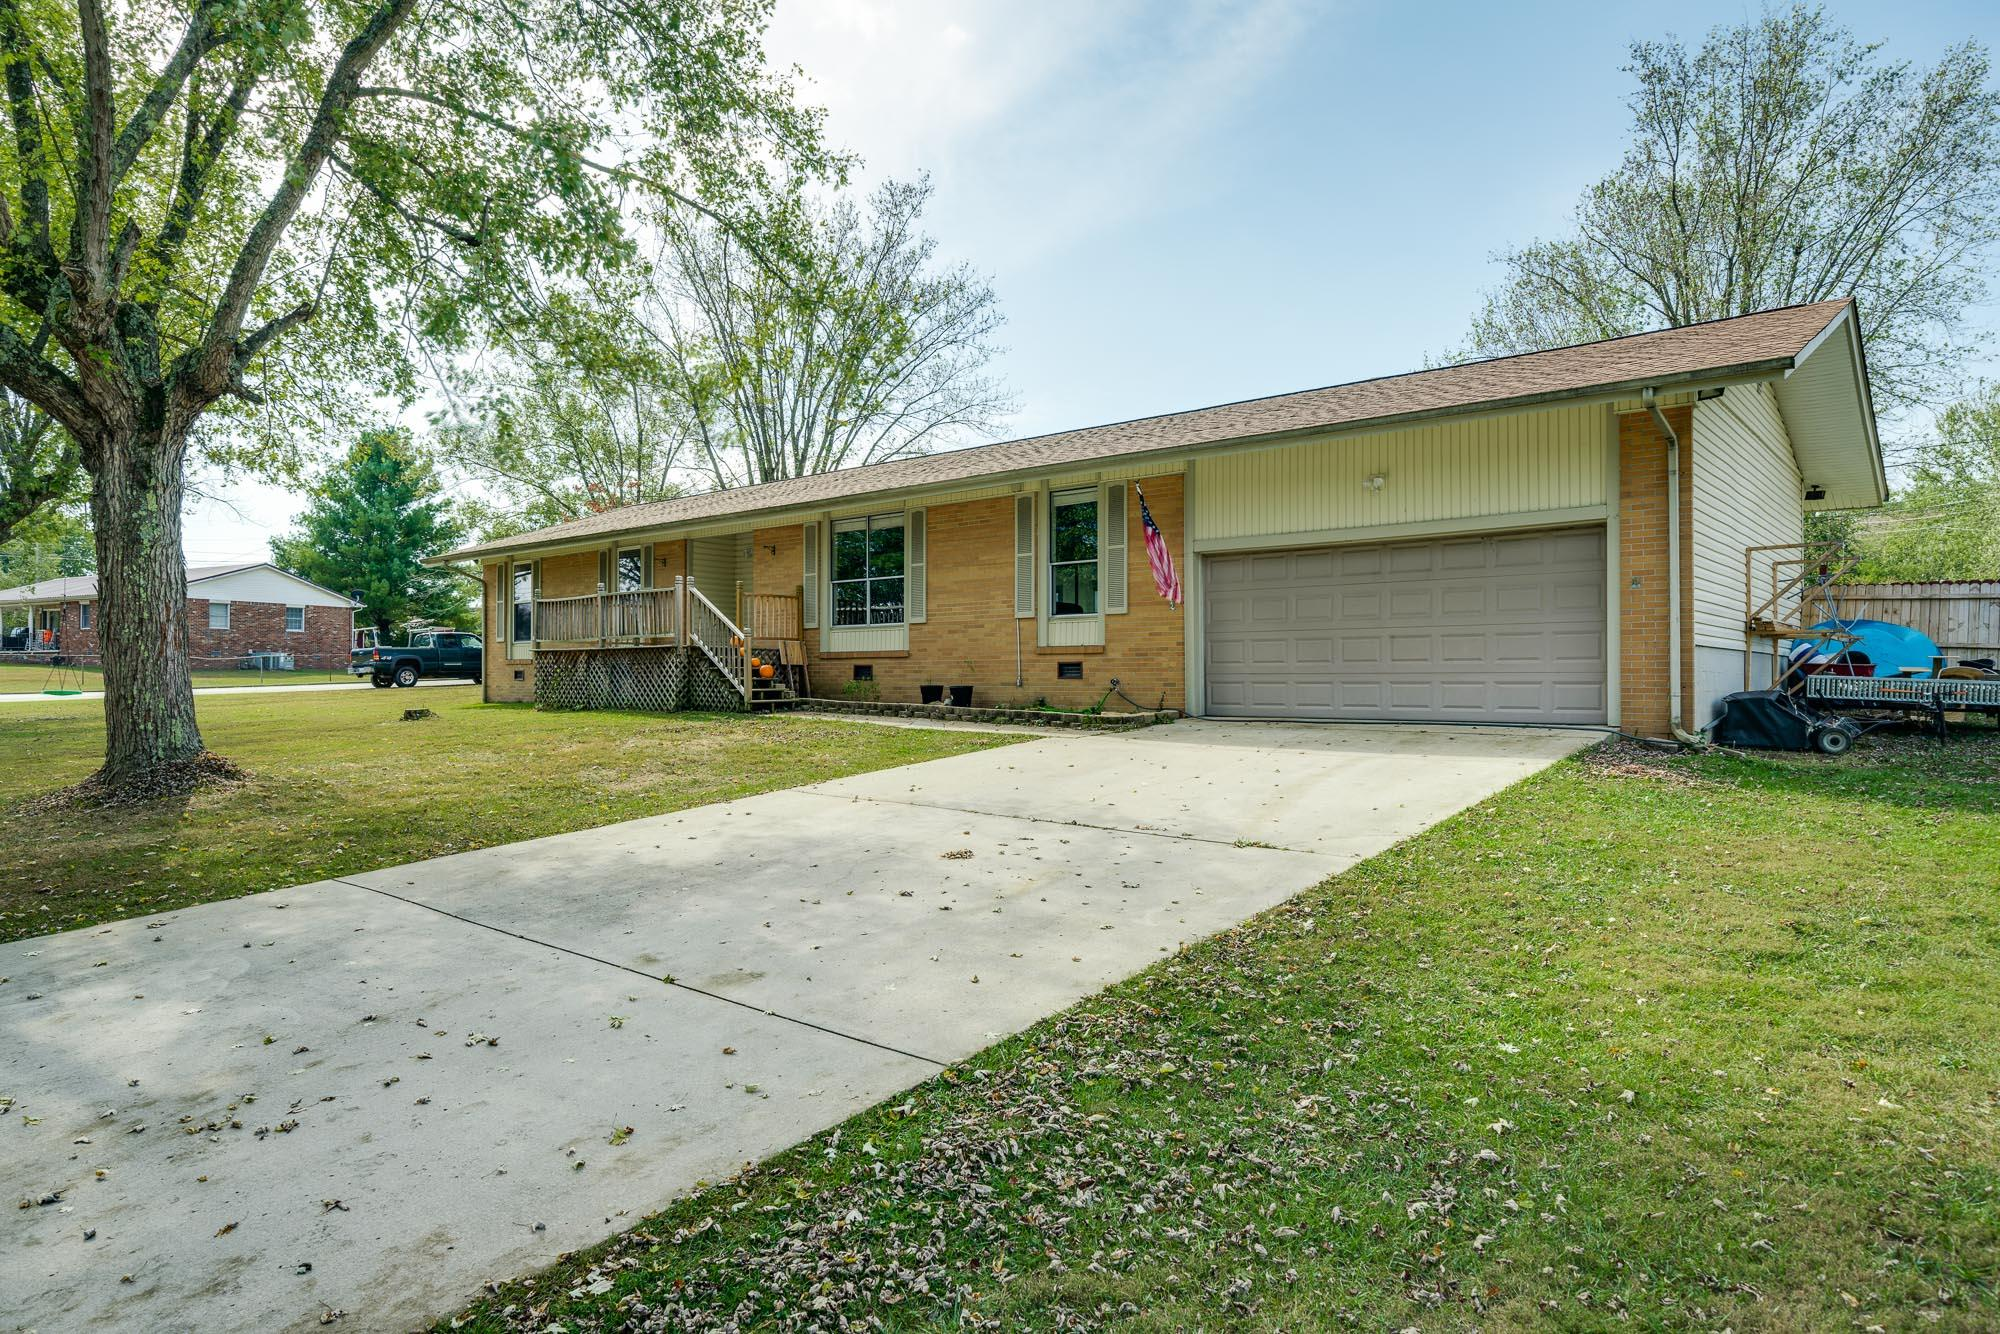 79 Ivanhoe Ln., Crossville, TN 38555 - Crossville, TN real estate listing